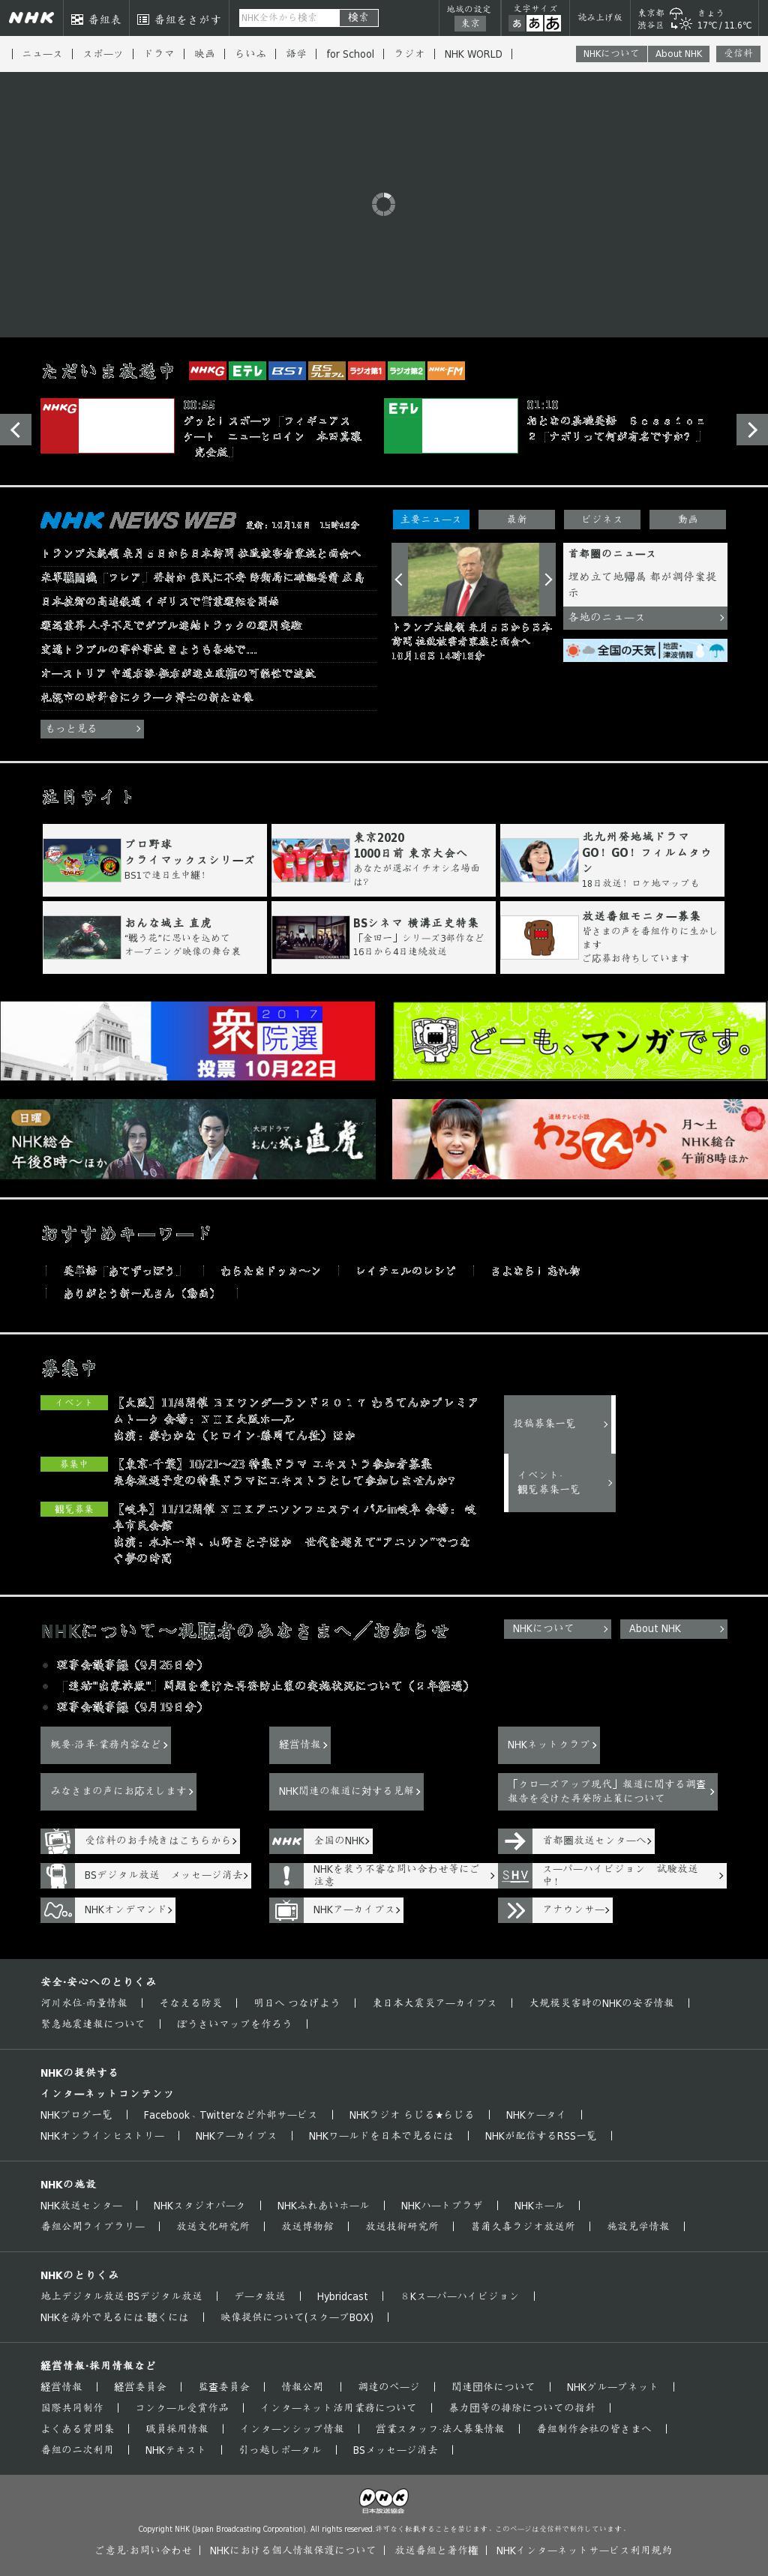 NHK Online at Monday Oct. 16, 2017, 4:11 p.m. UTC